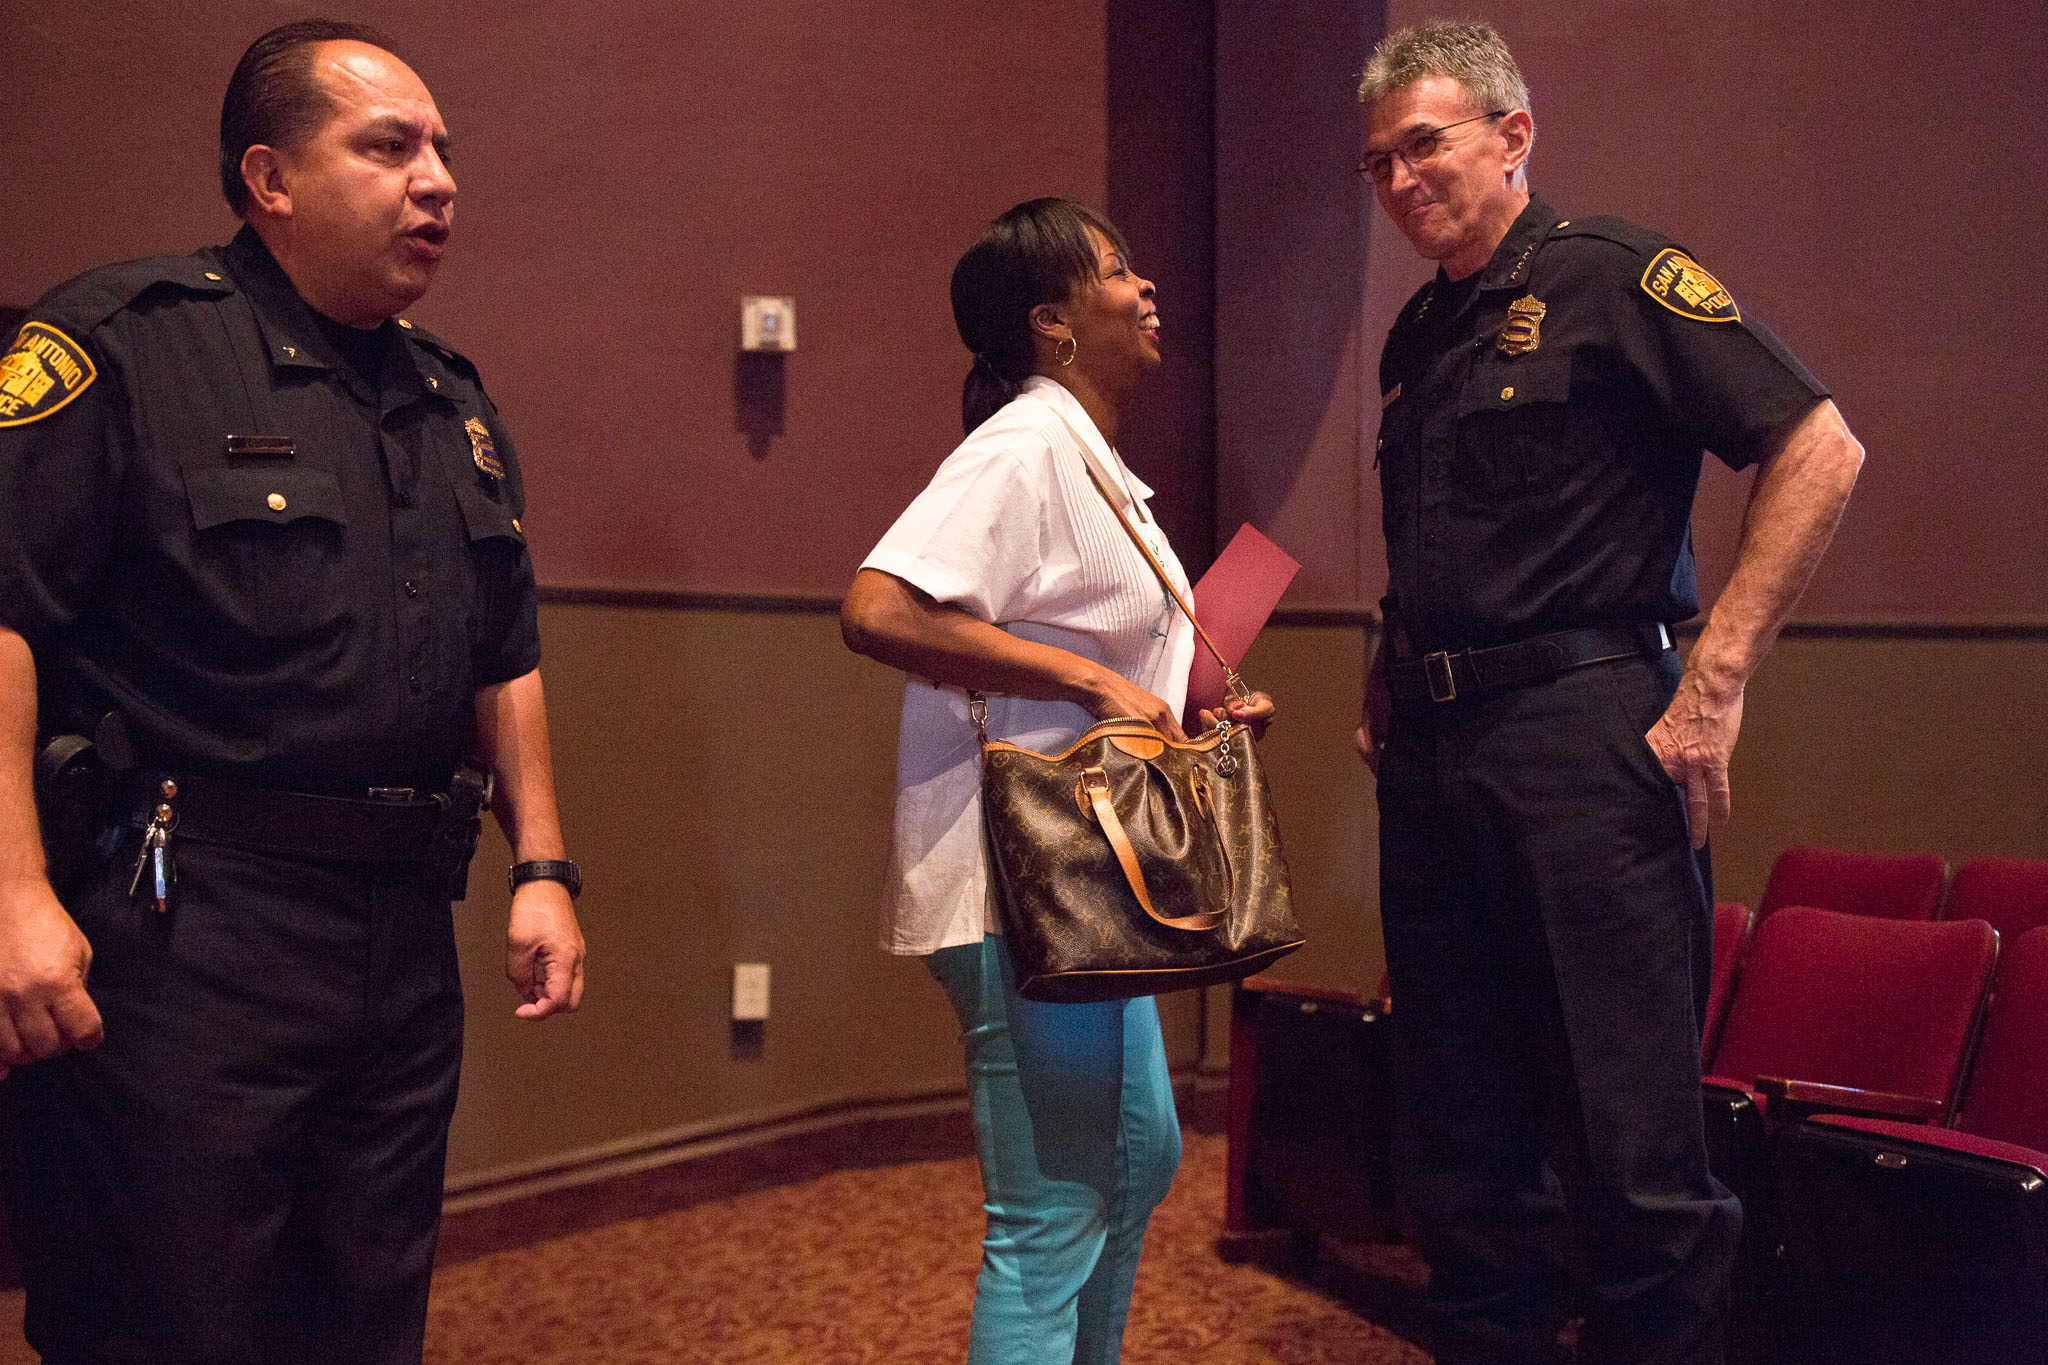 Mayor Ivy Taylor greets San Antonio Police Chief William McManus before presentations begin. Photo by Scott Ball.